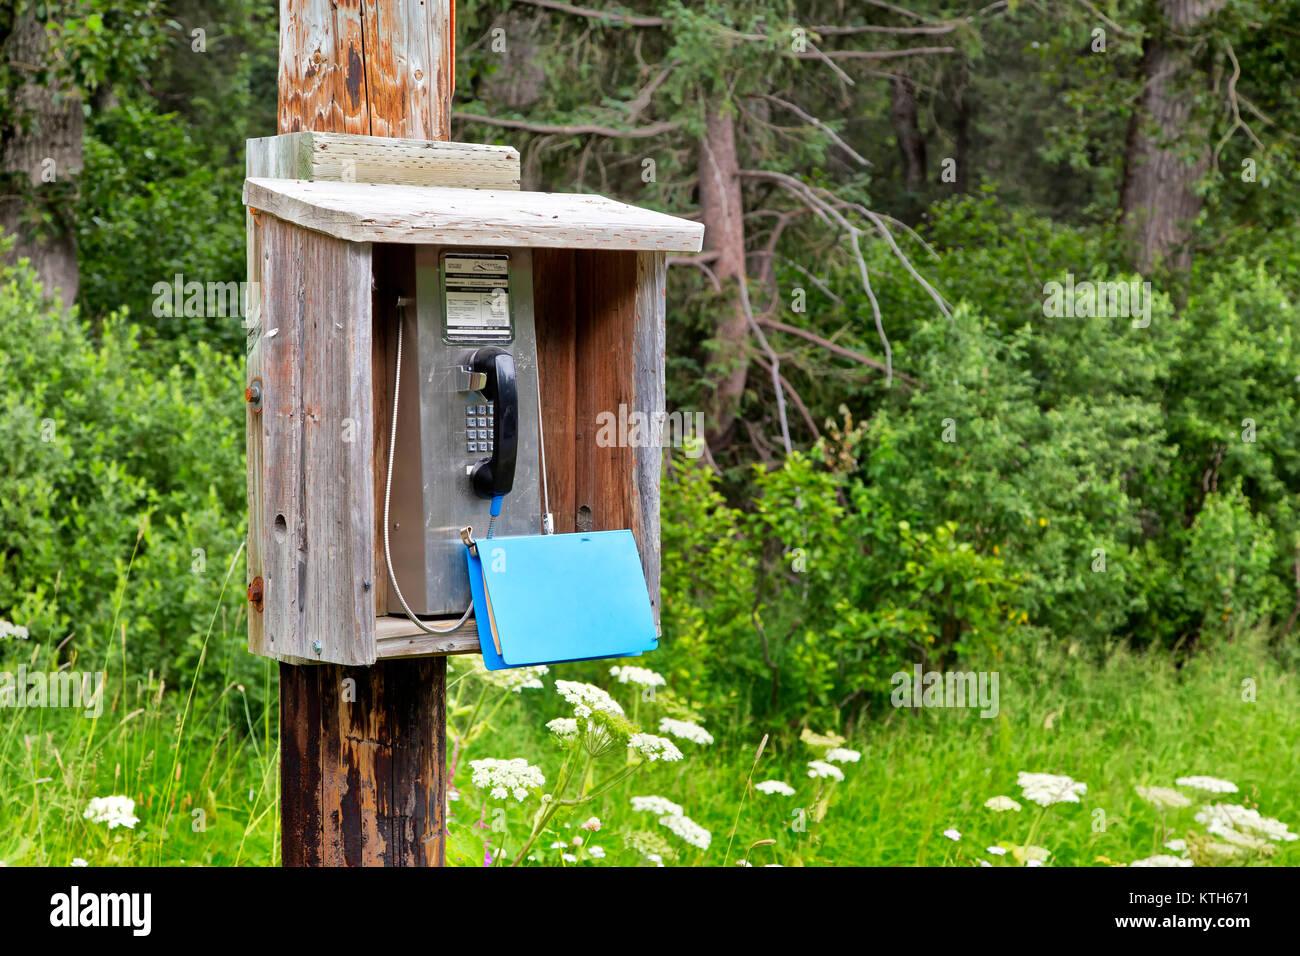 Public Payphone located on Richardson Highway. - Stock Image